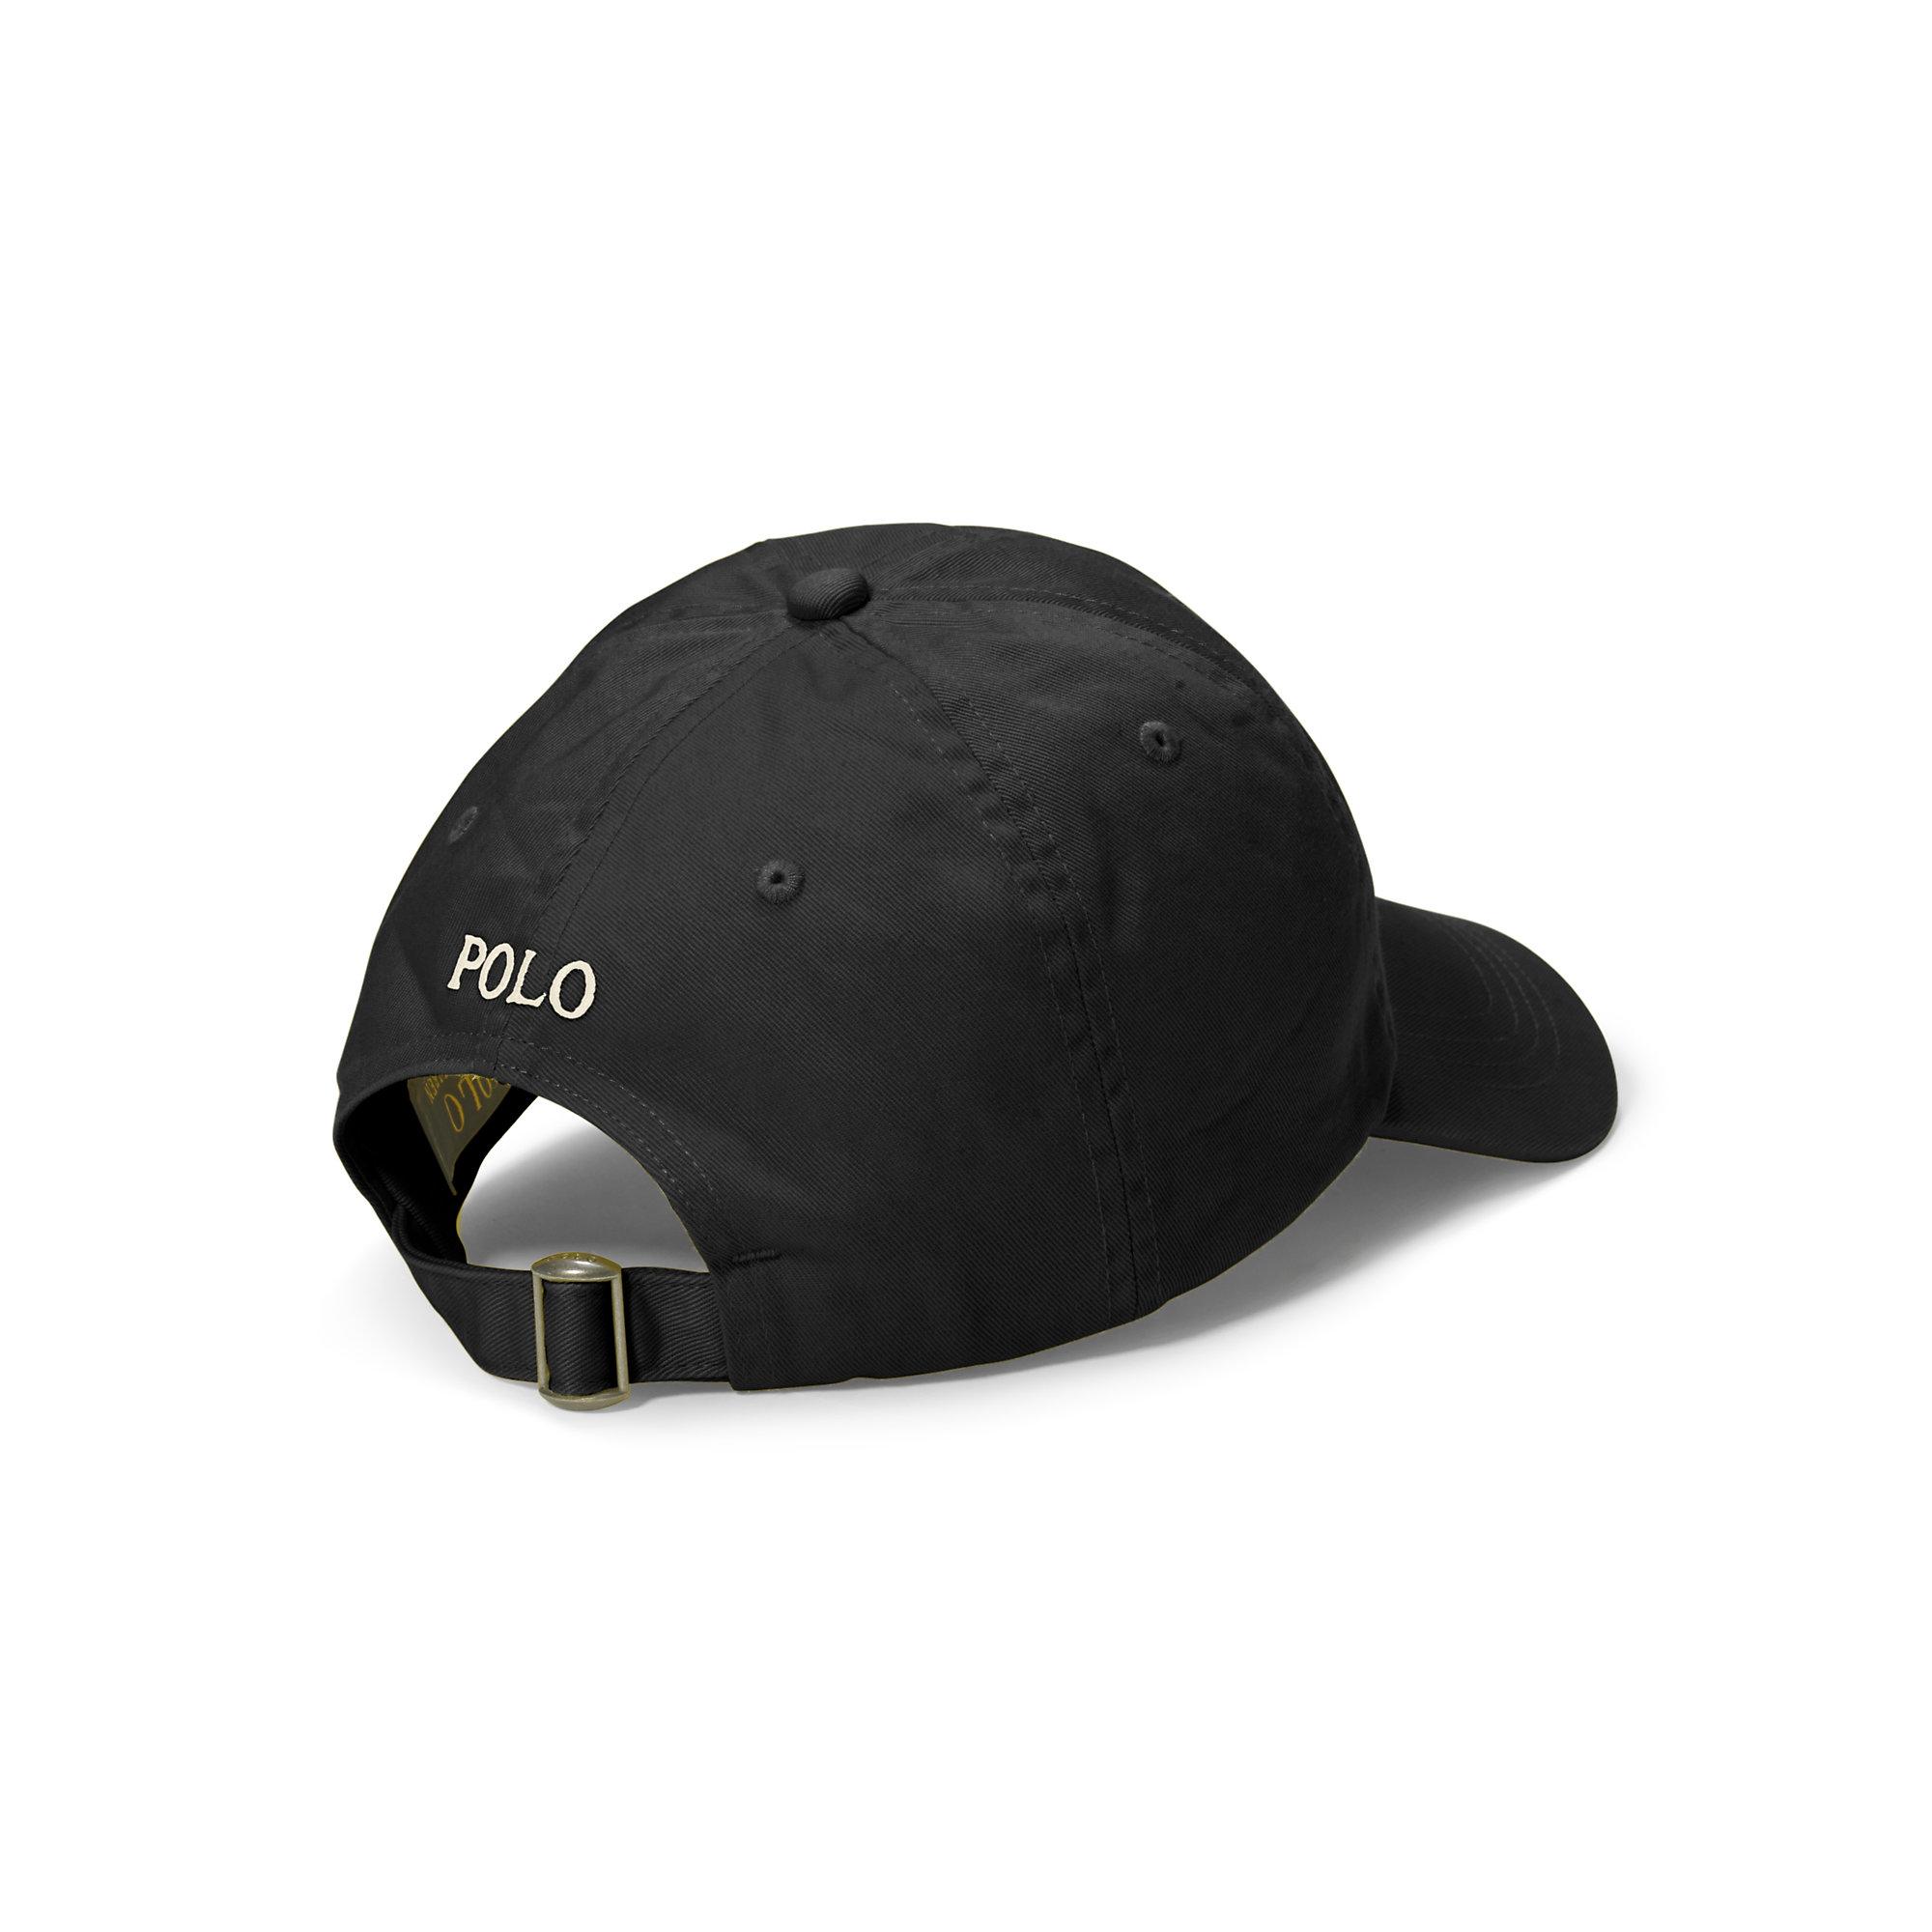 2b1a258a052 Lyst - Polo Ralph Lauren Polo Script Chino Baseball Cap in Black for Men